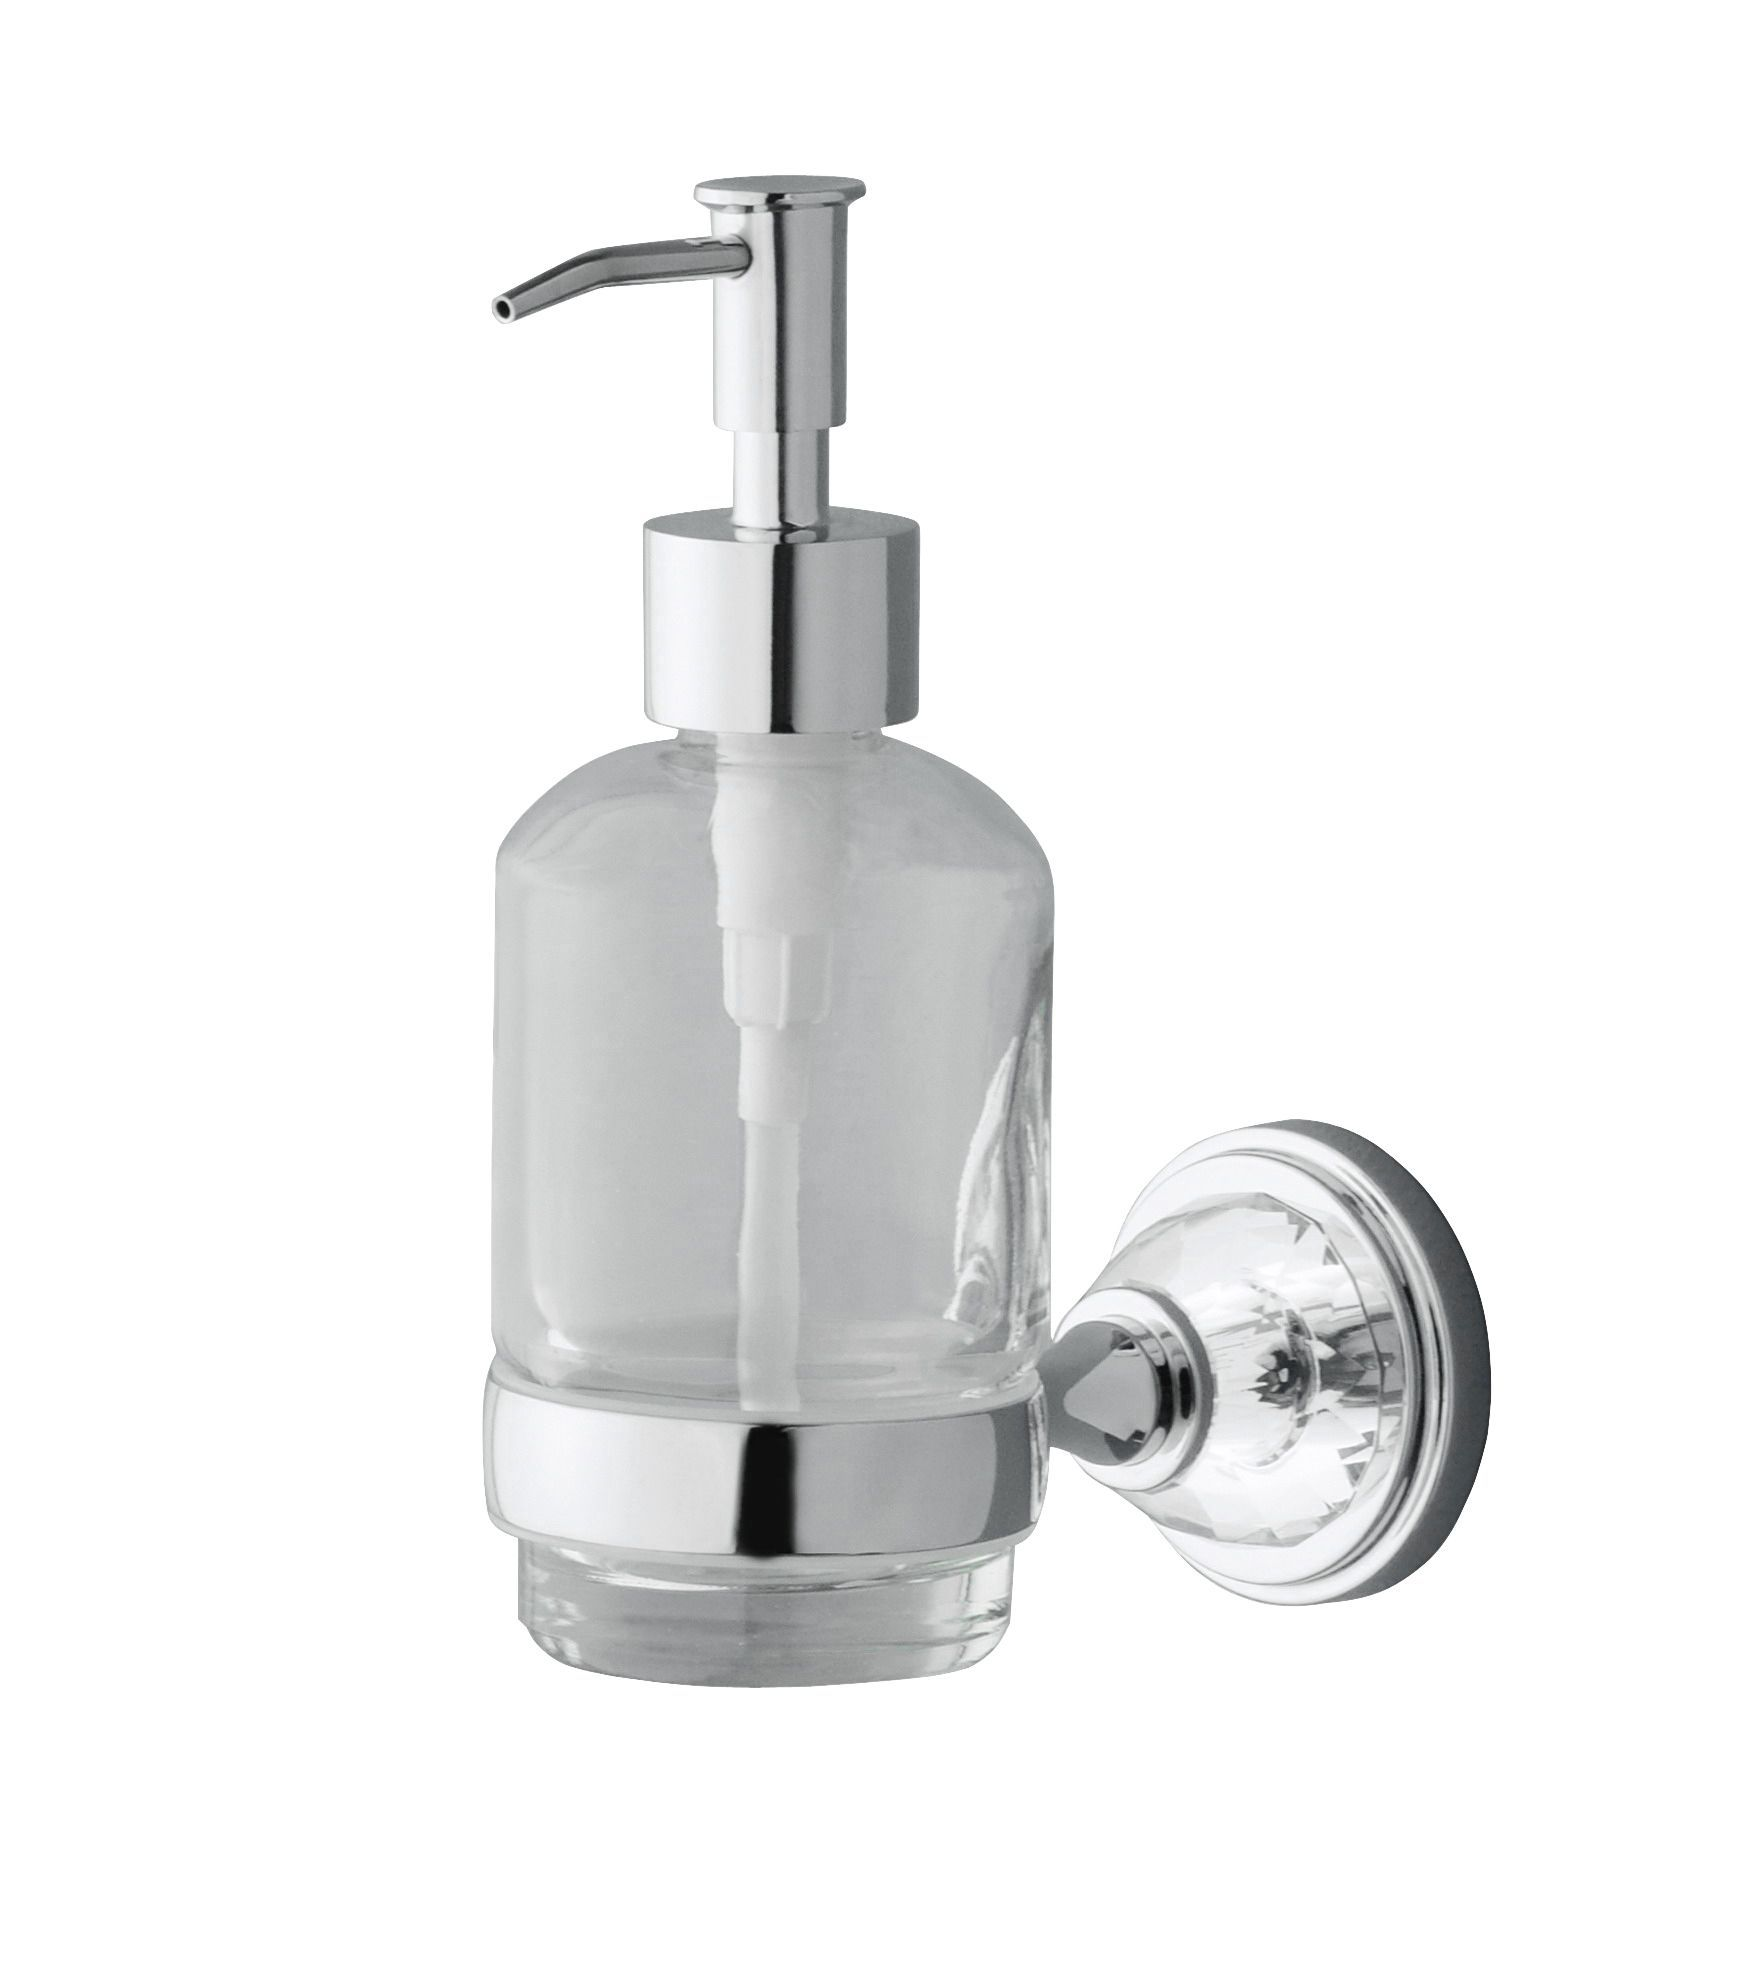 Image Result For Bathroom Ideas C B Eva Bathroom Accessories Bq Eva Bathroom Accessories